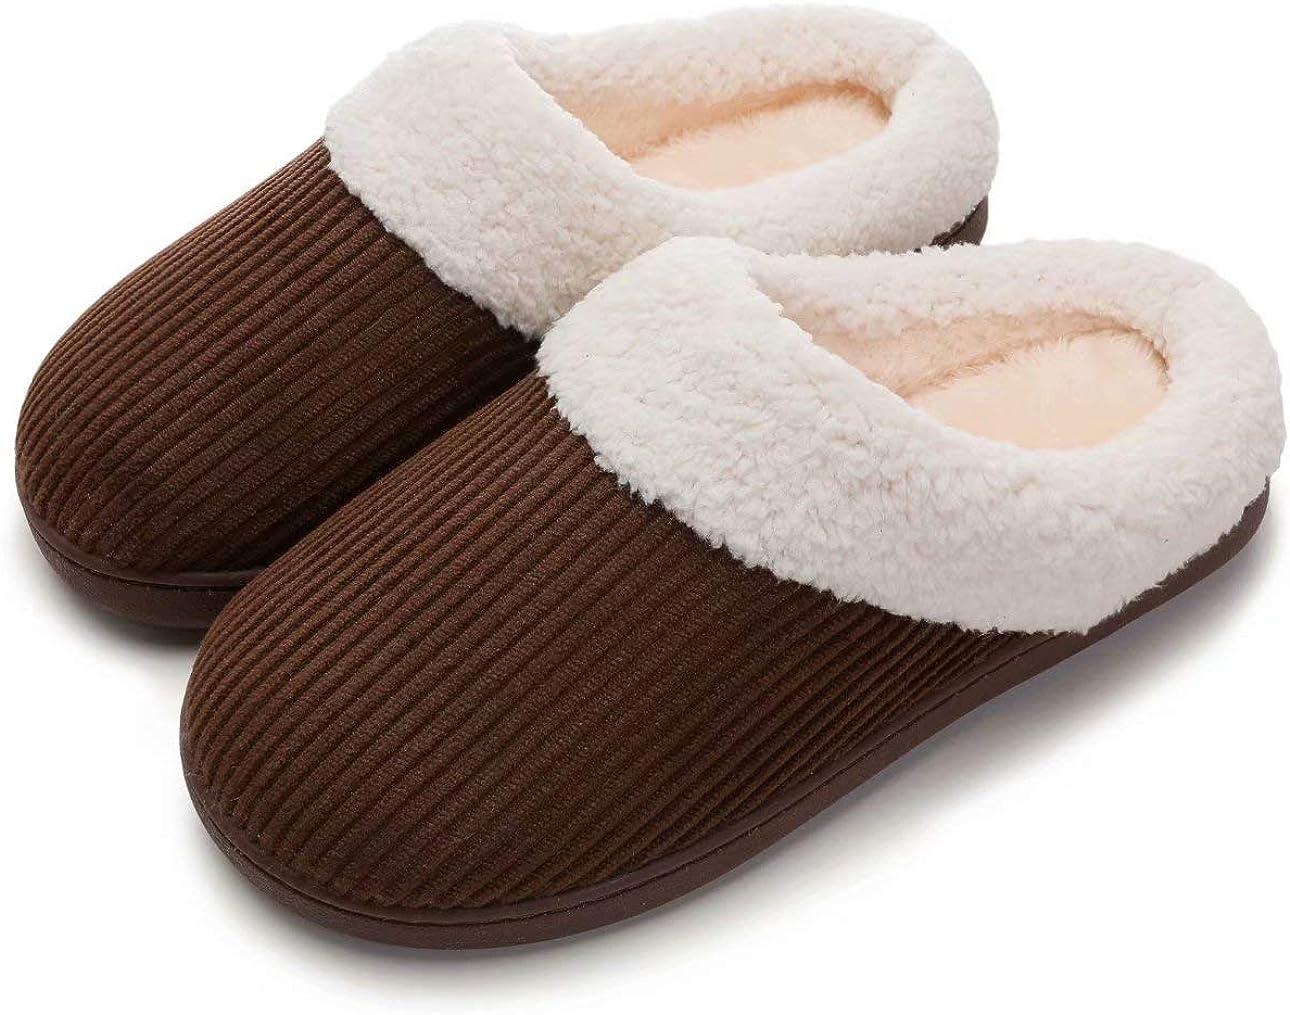 Blebeey Women's Slip On Cozy Slippers